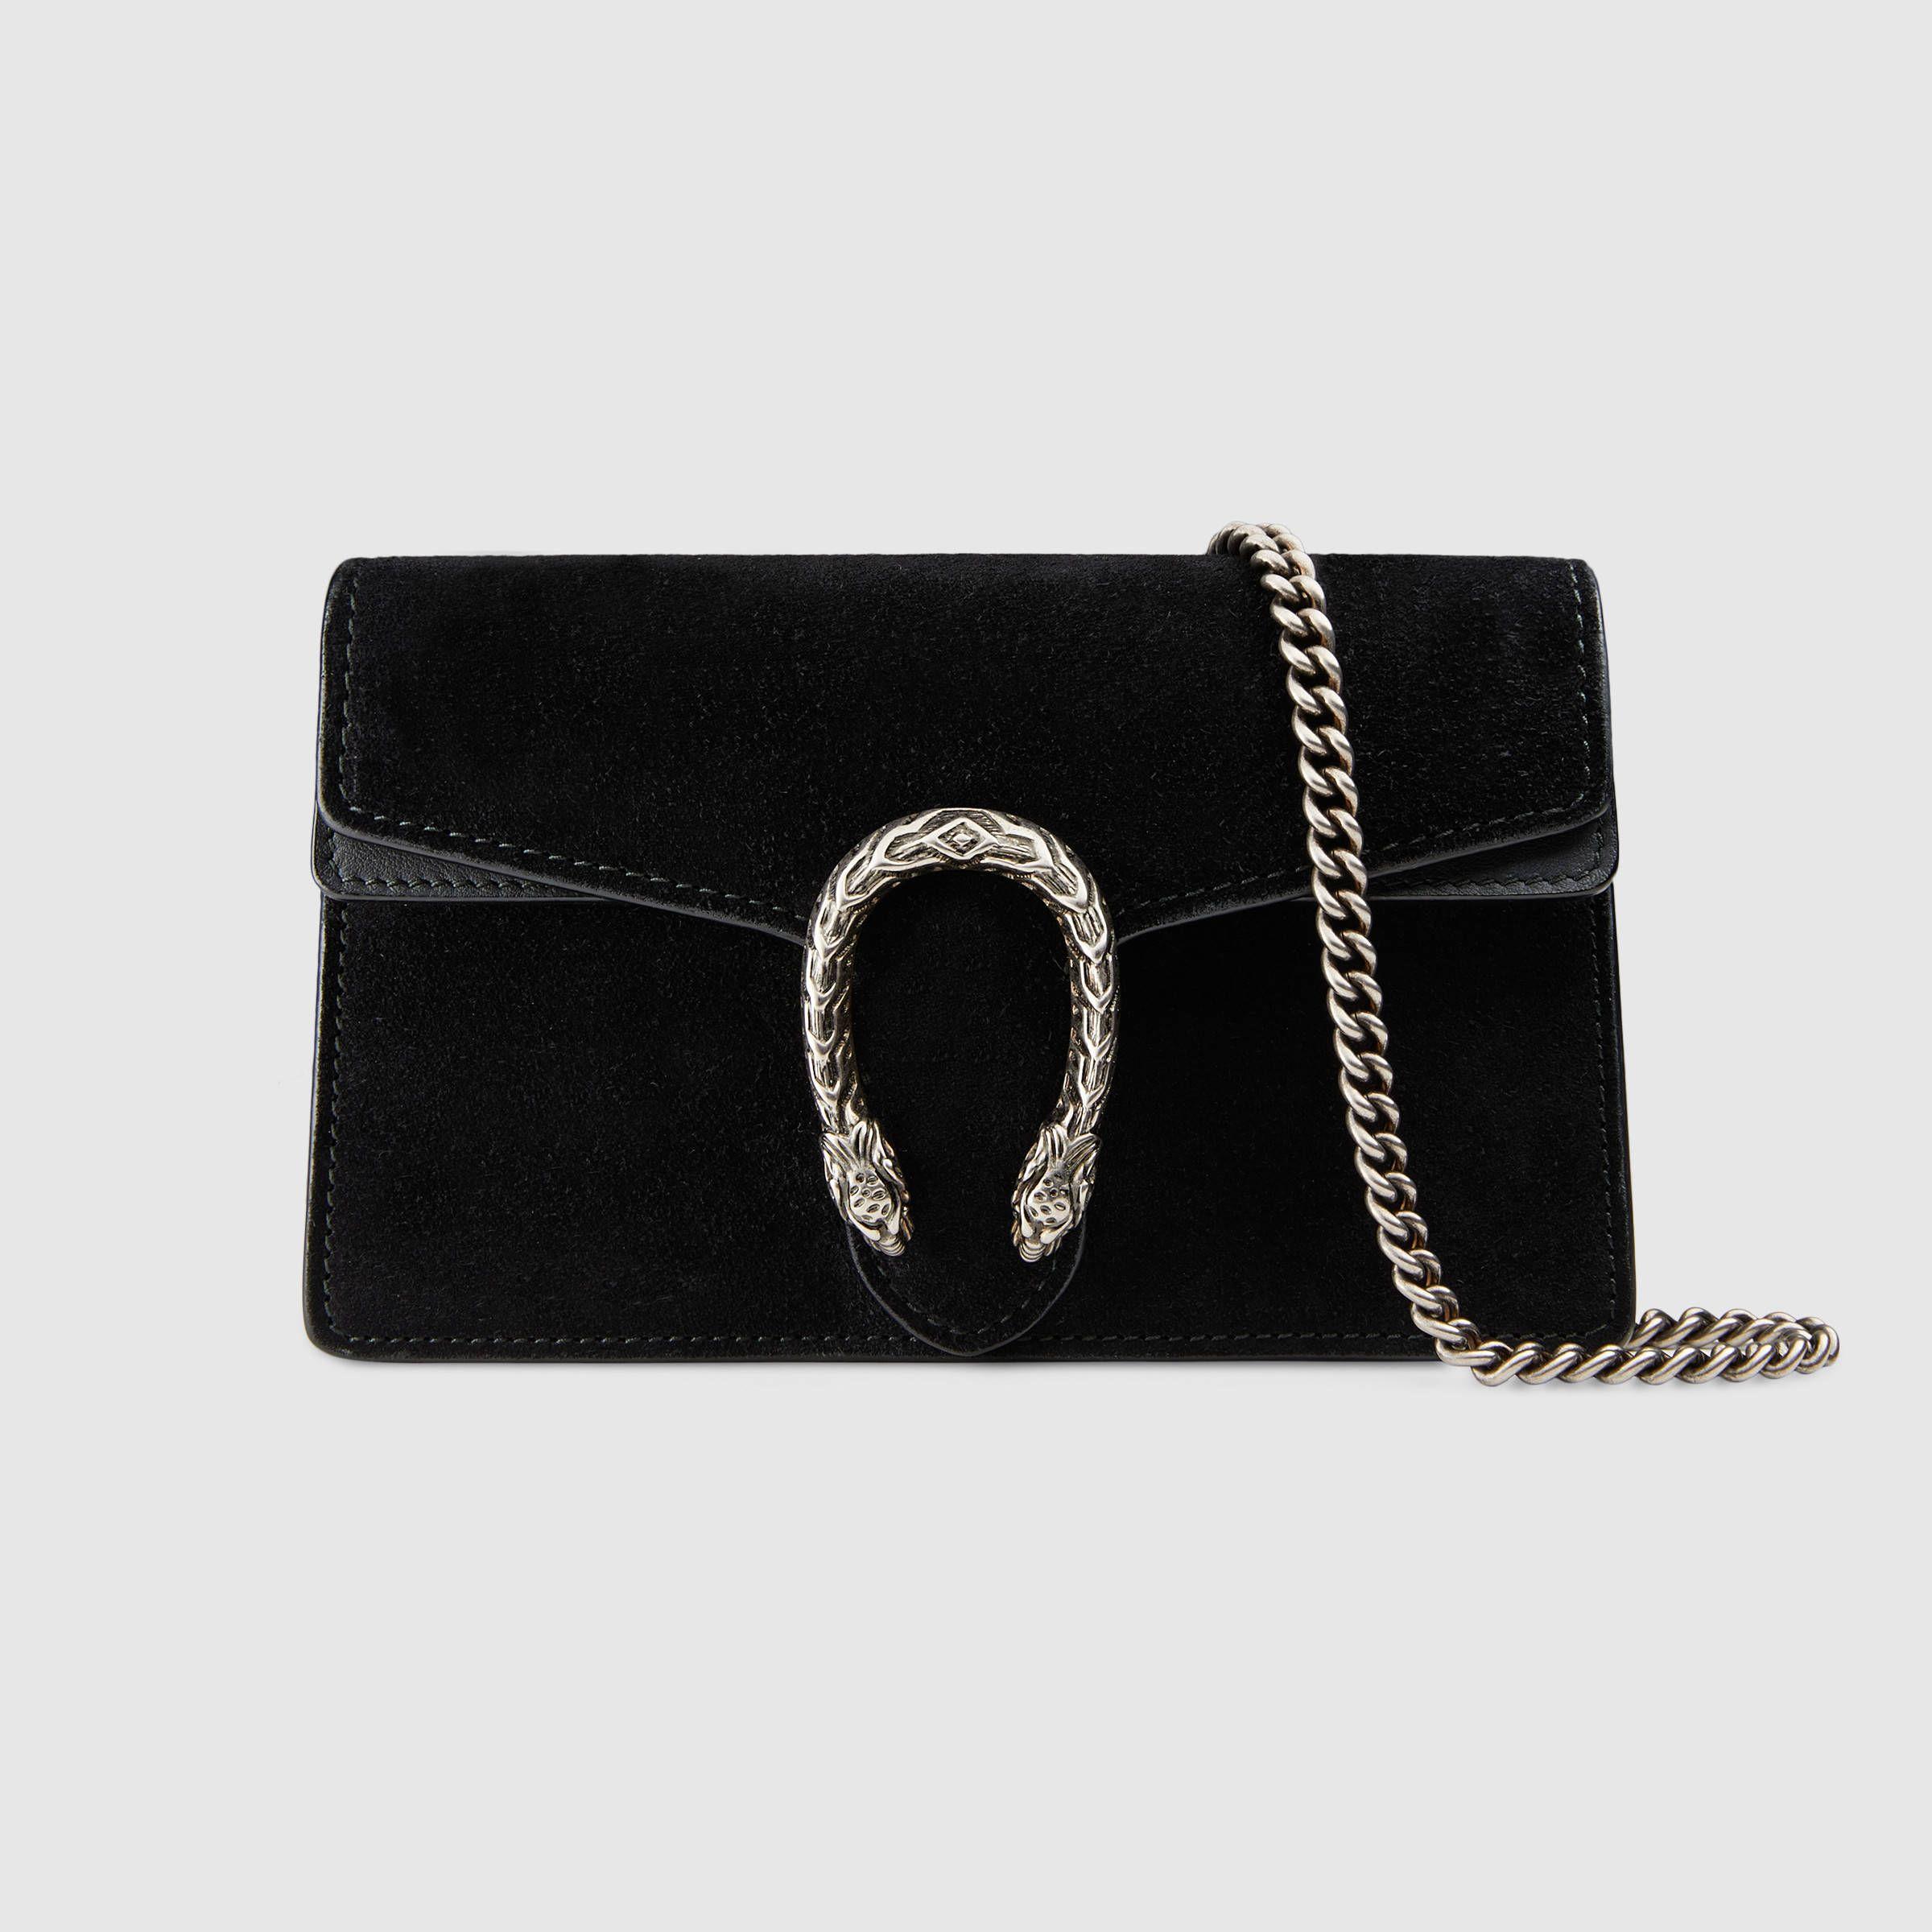 953fbef29 Dionysus leather mini bag | Handbags | Gucci handbags sale, Gucci ...